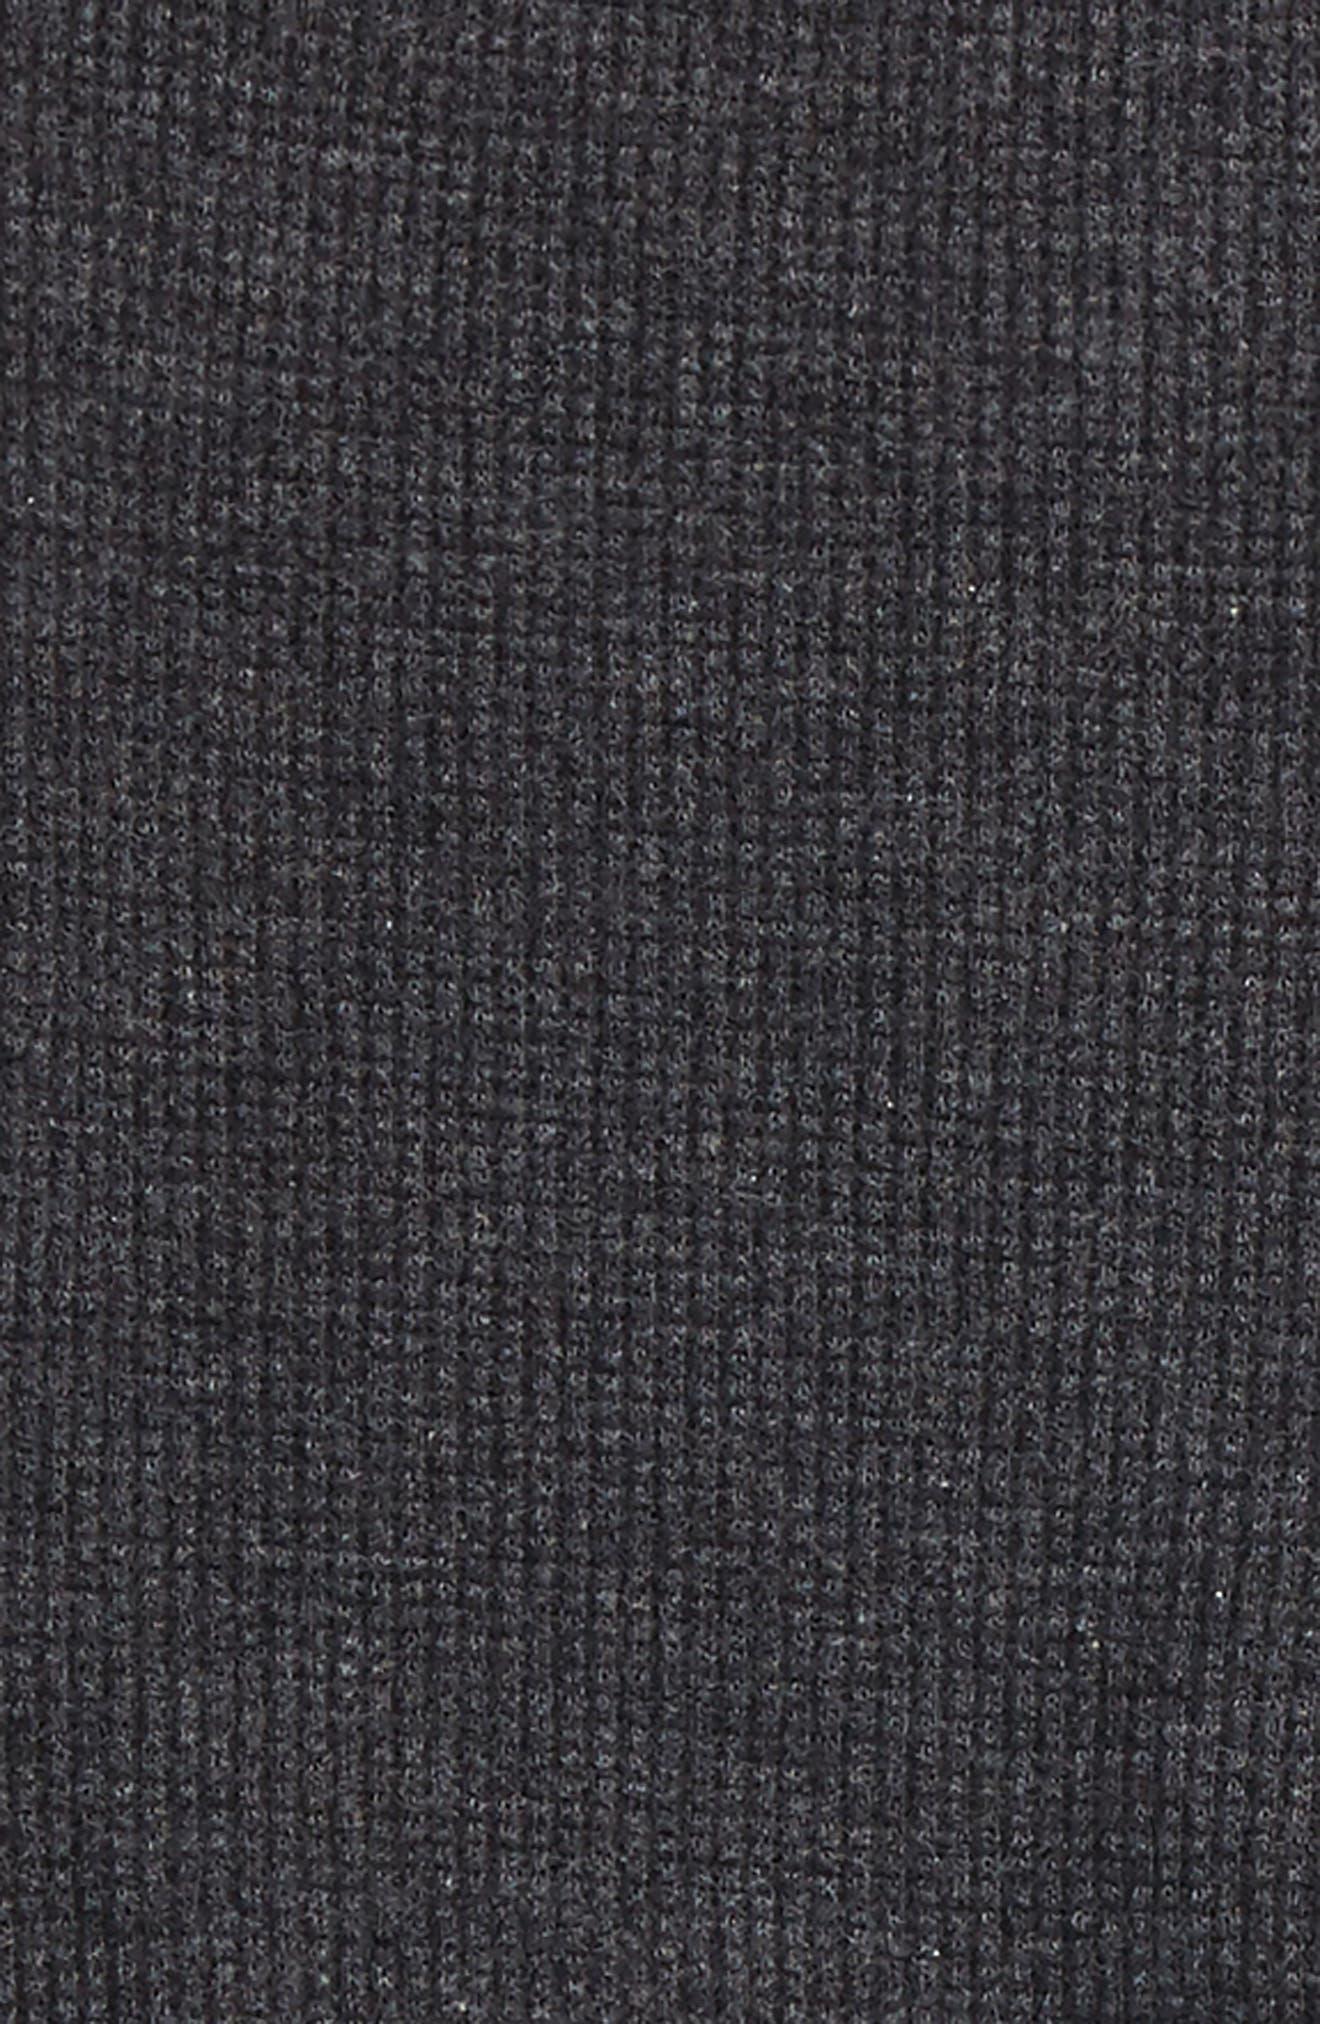 Thermal Ruffle Skater Dress & Leggings Set,                             Alternate thumbnail 2, color,                             Coal Heather